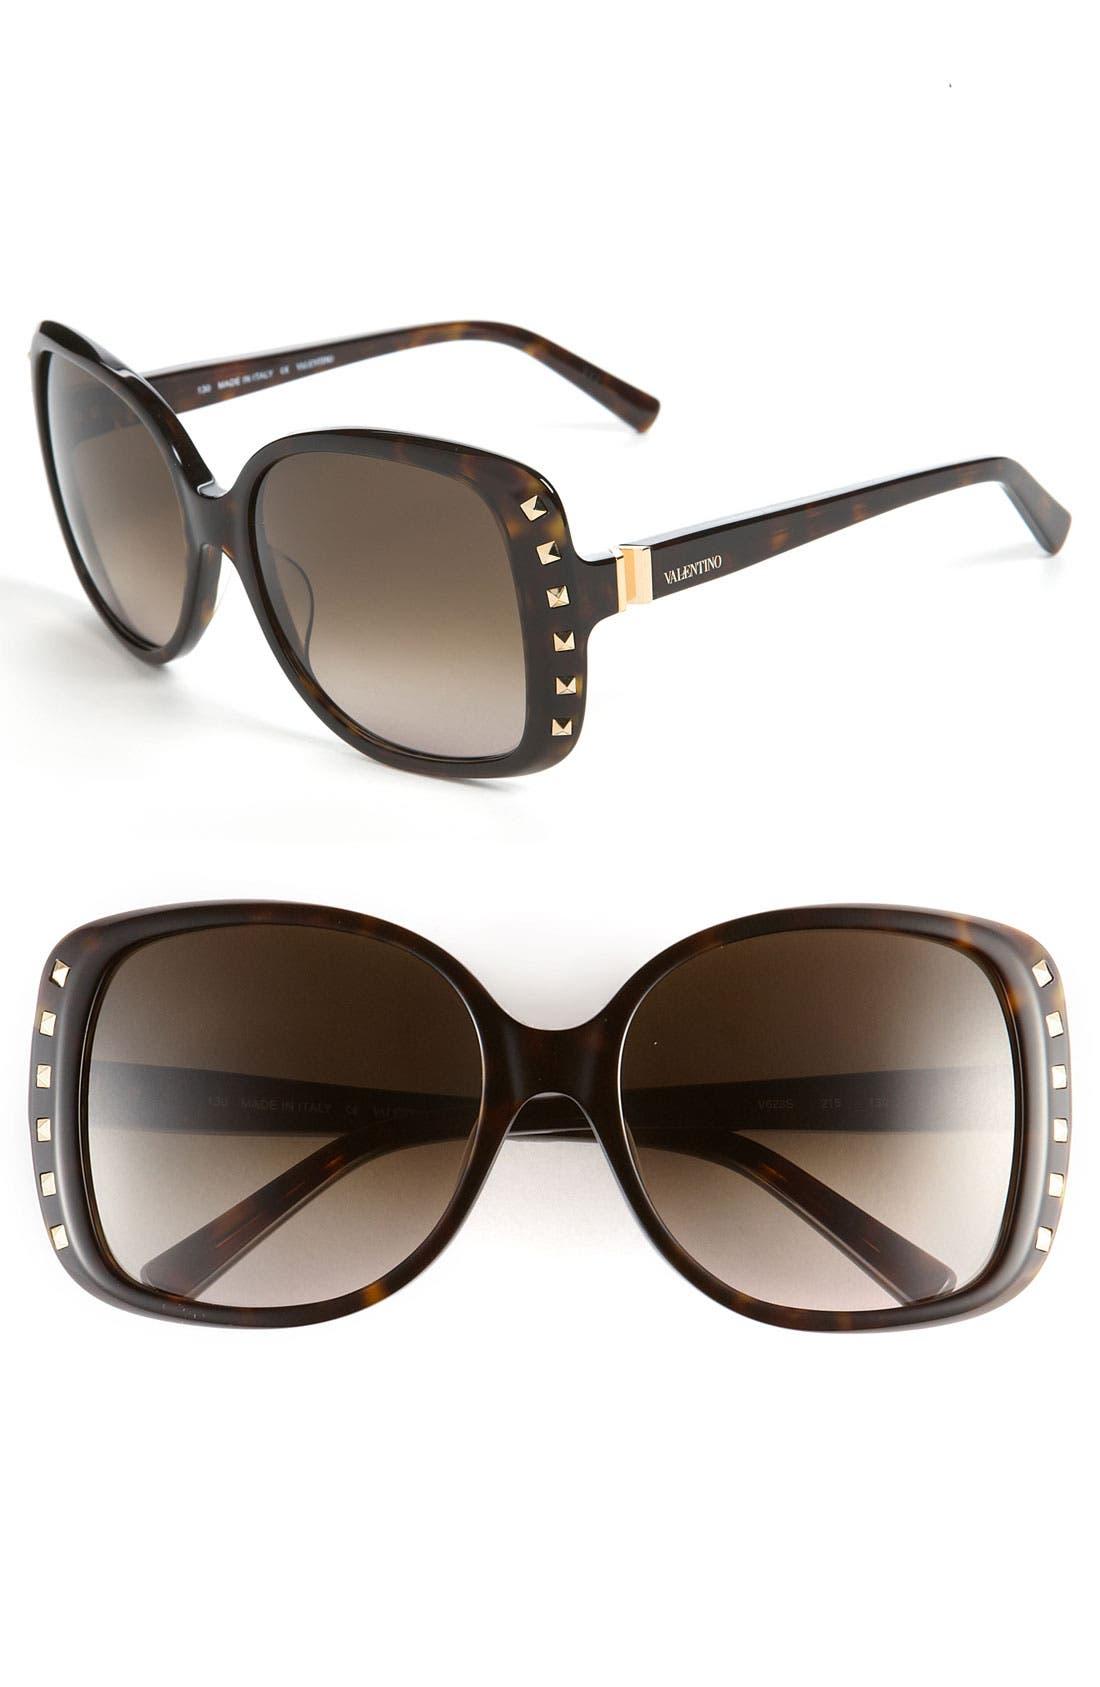 Alternate Image 1 Selected - Valentino 'Classic' Studded Sunglasses